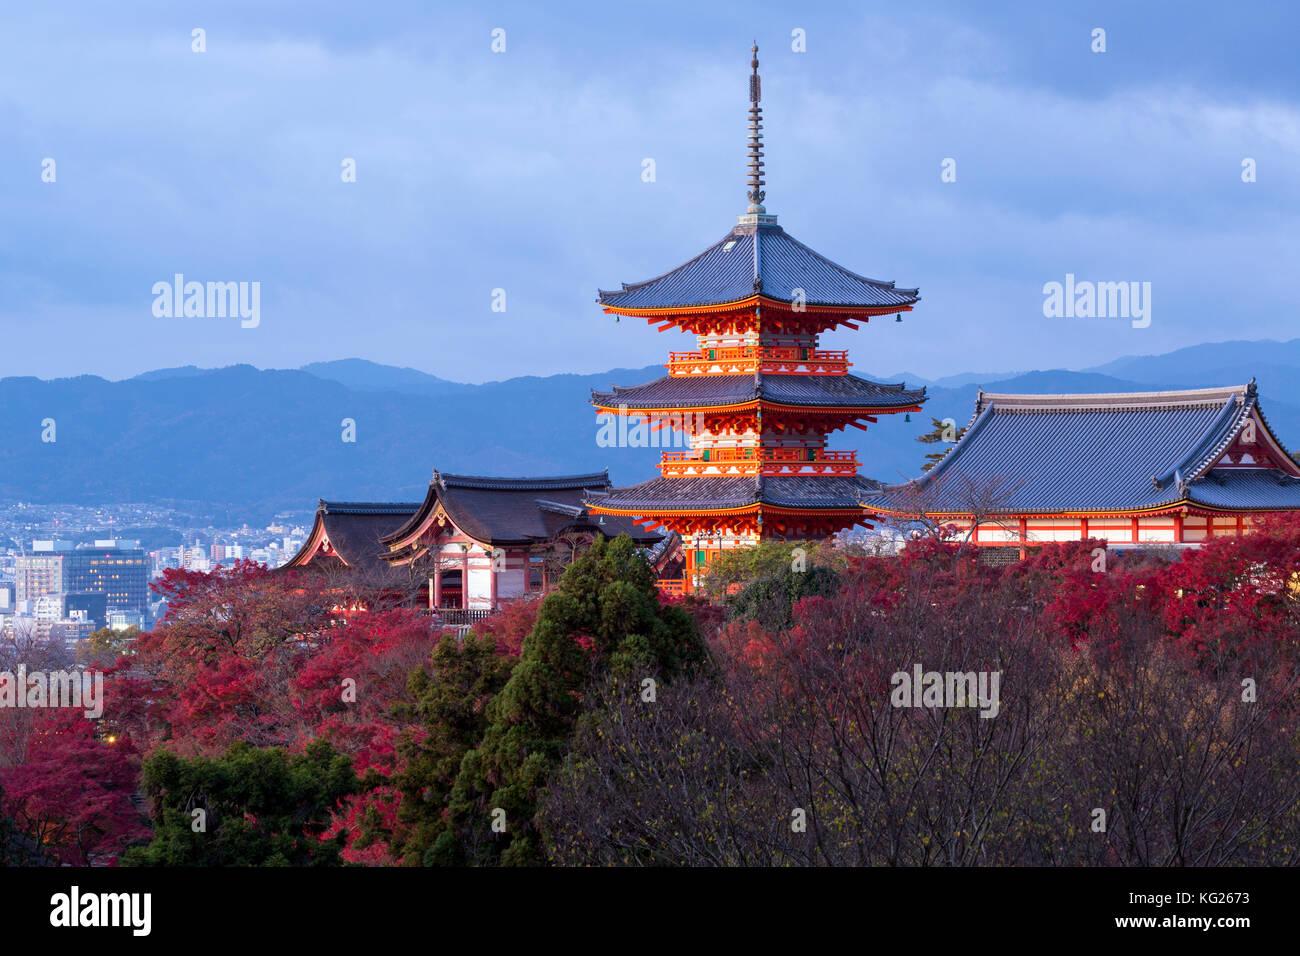 Kiyomizu-dera tempio, sito patrimonio mondiale dell'unesco, Kyoto, Honshu, Giappone, Asia Immagini Stock